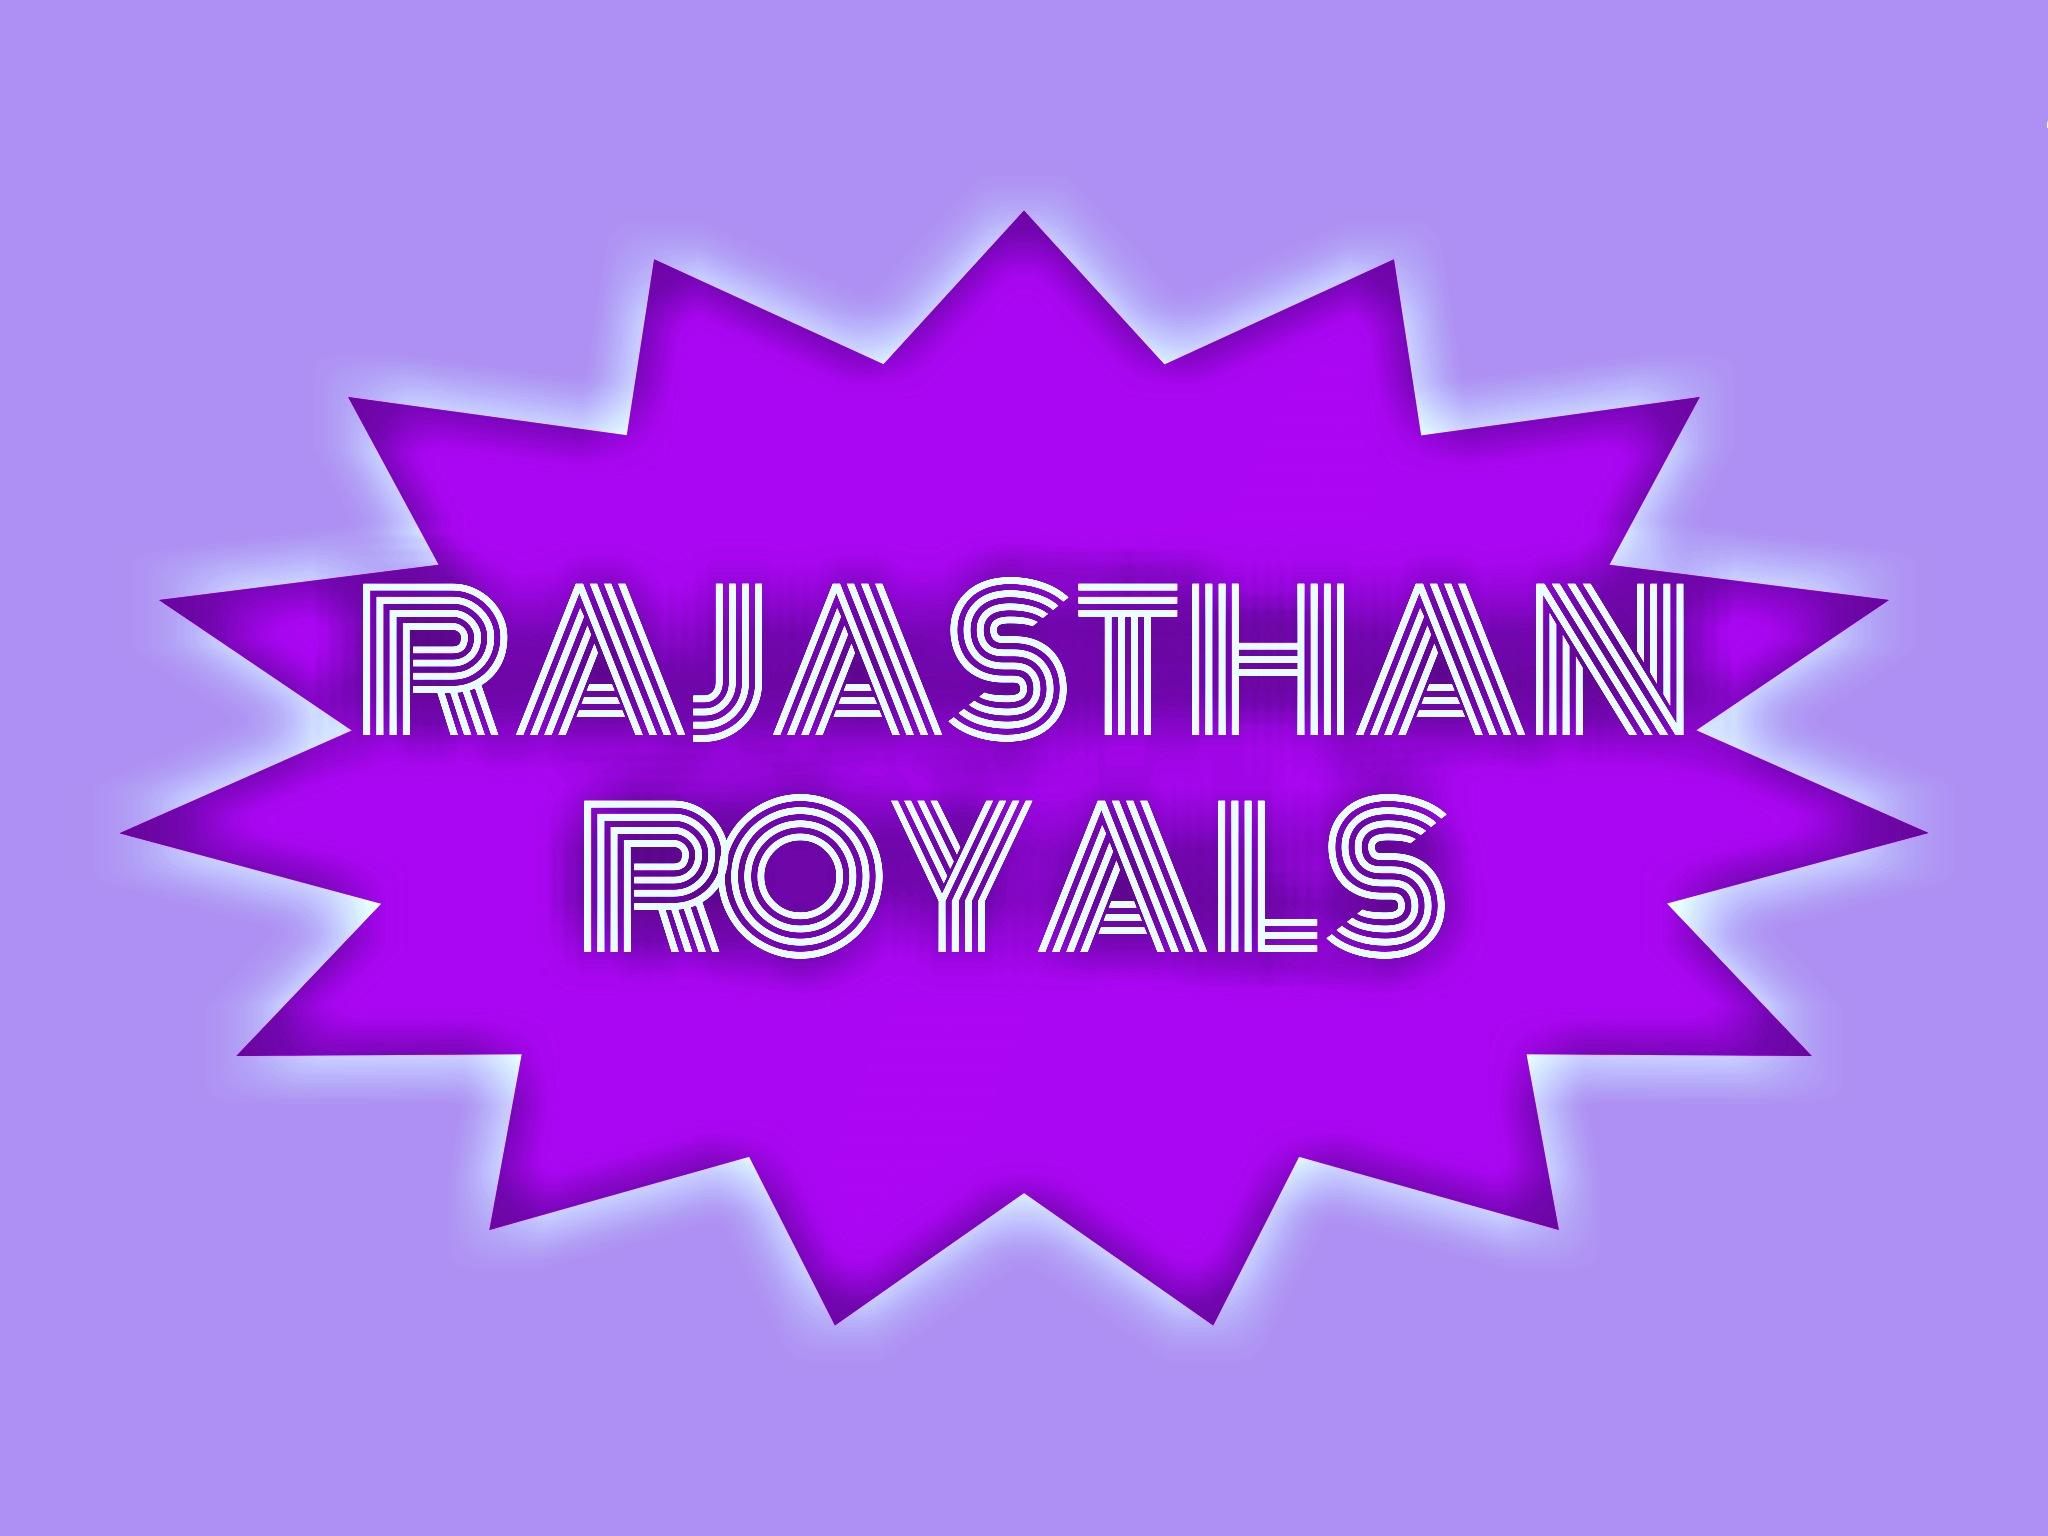 IPL team Rajasthan royals illustration